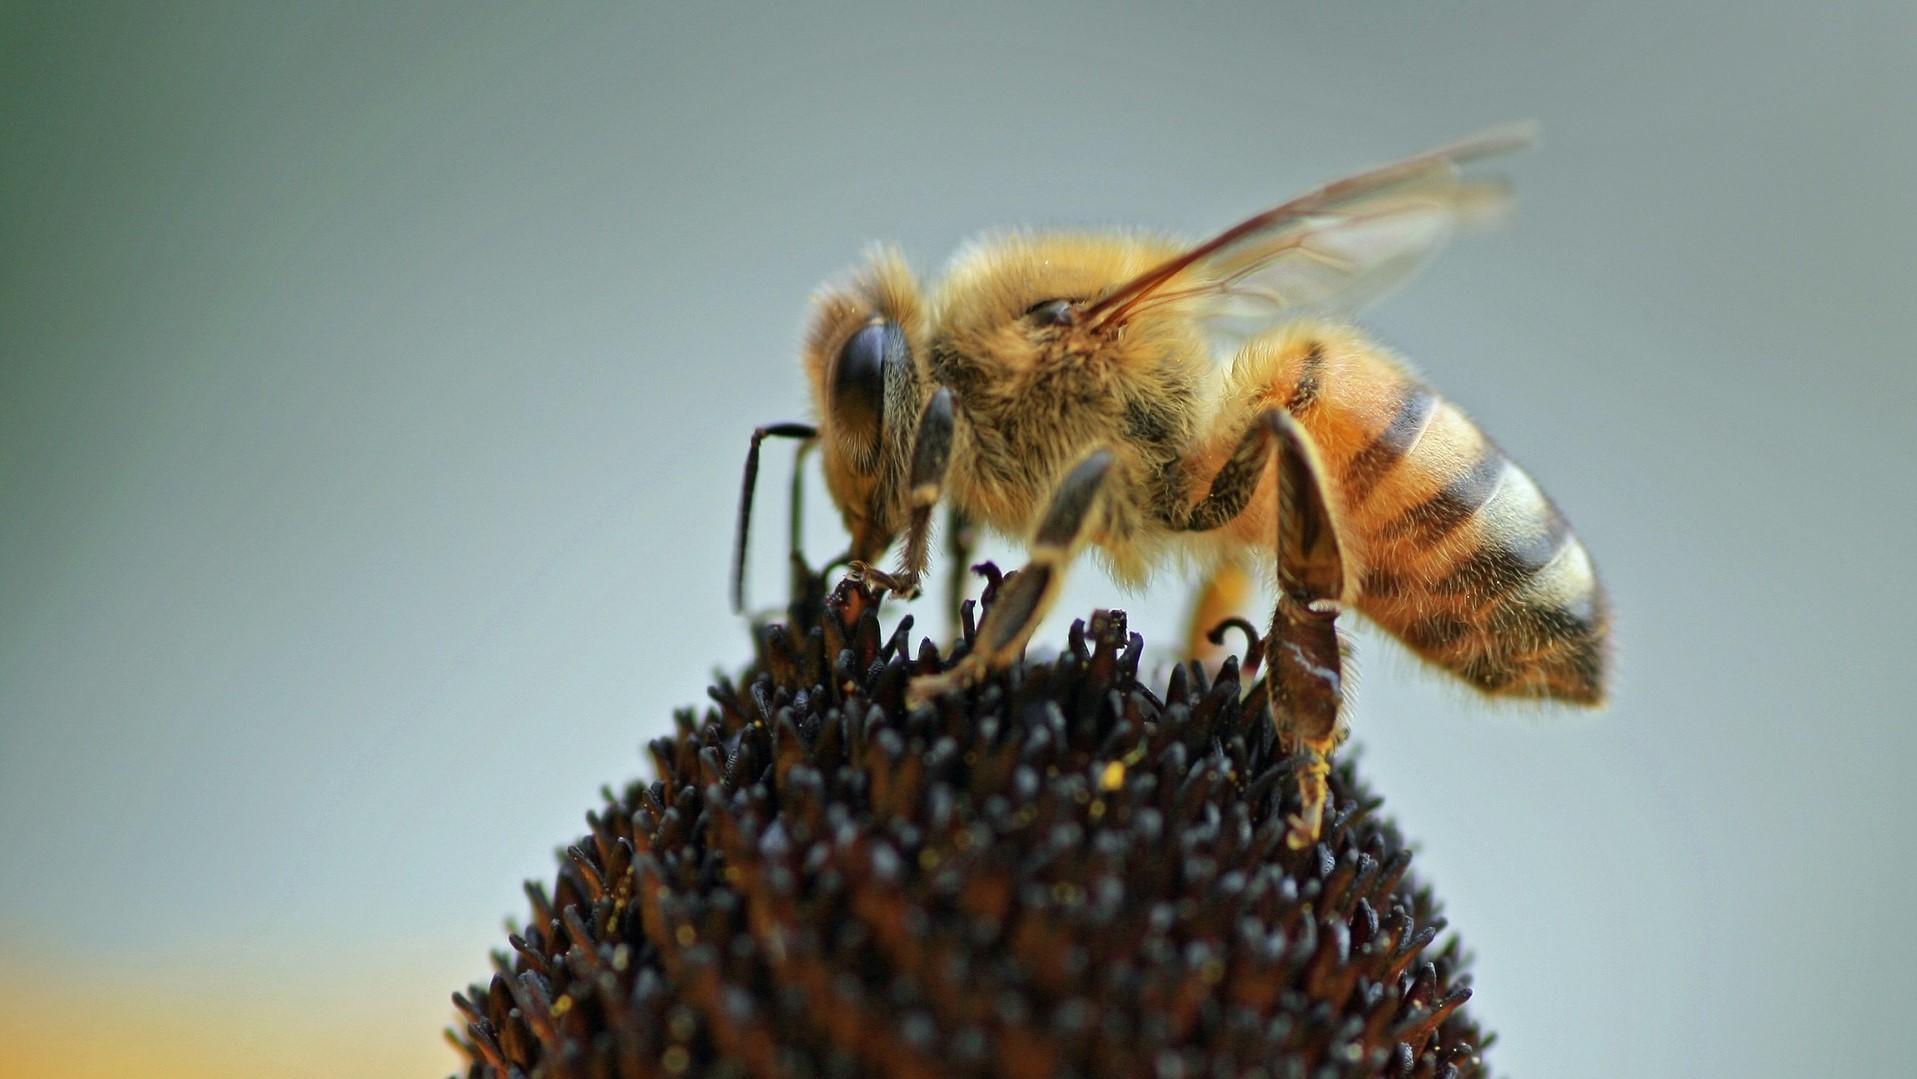 Attract Bees - Attract honey bees - honey bee